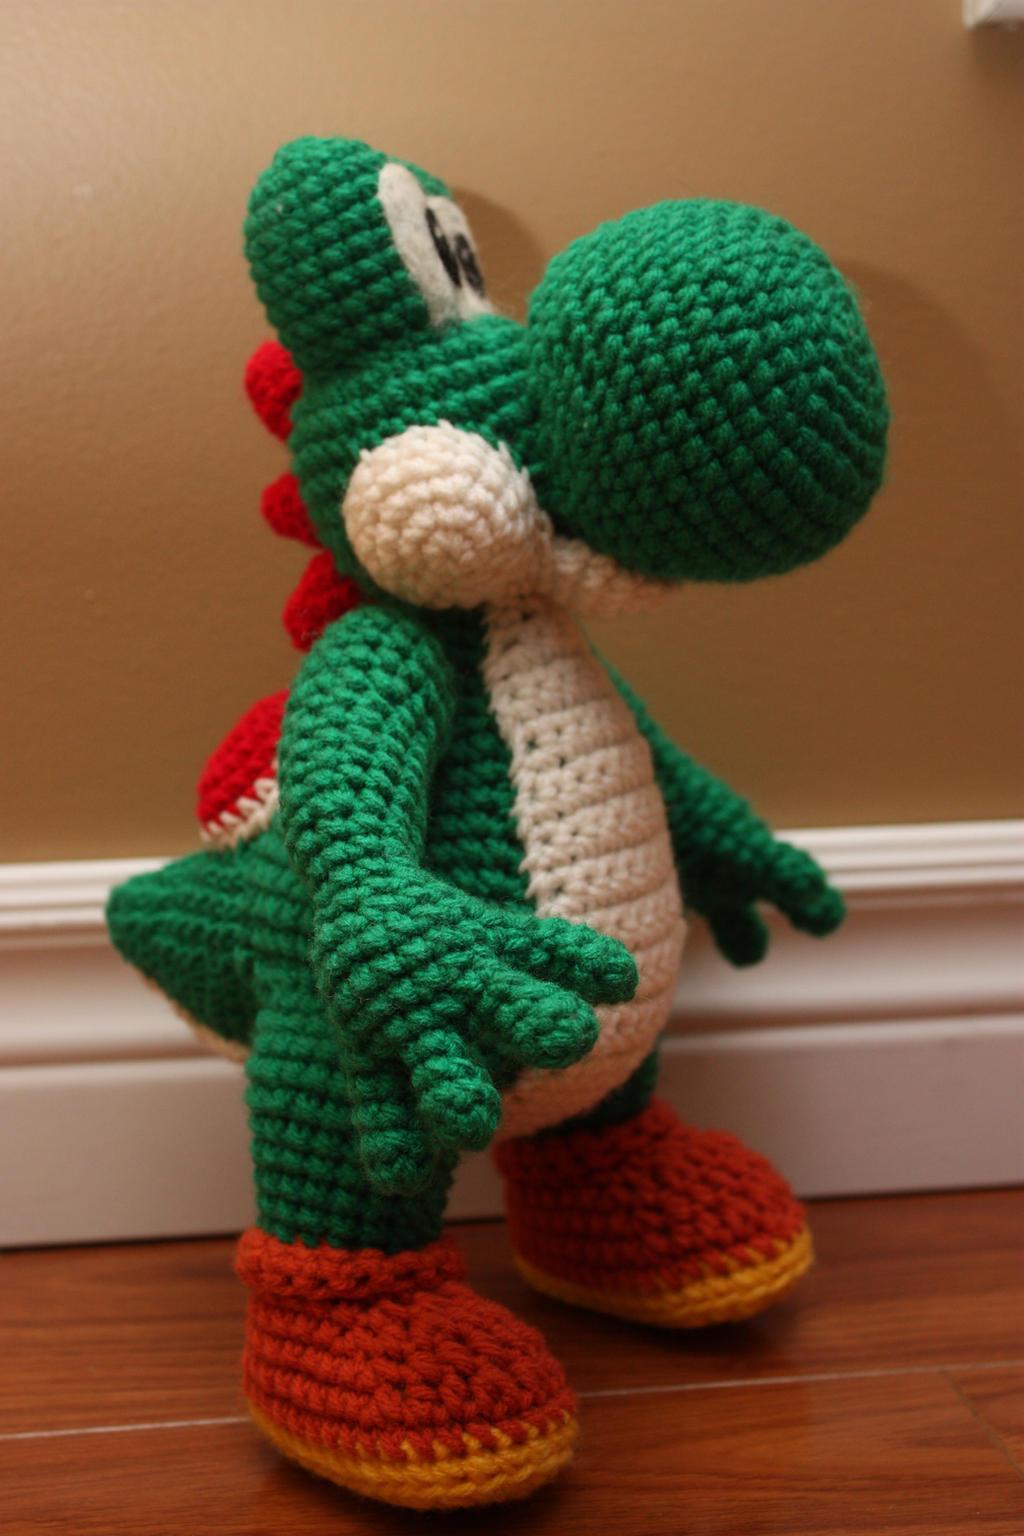 Crochet Yoshi by rdekroon on DeviantArt